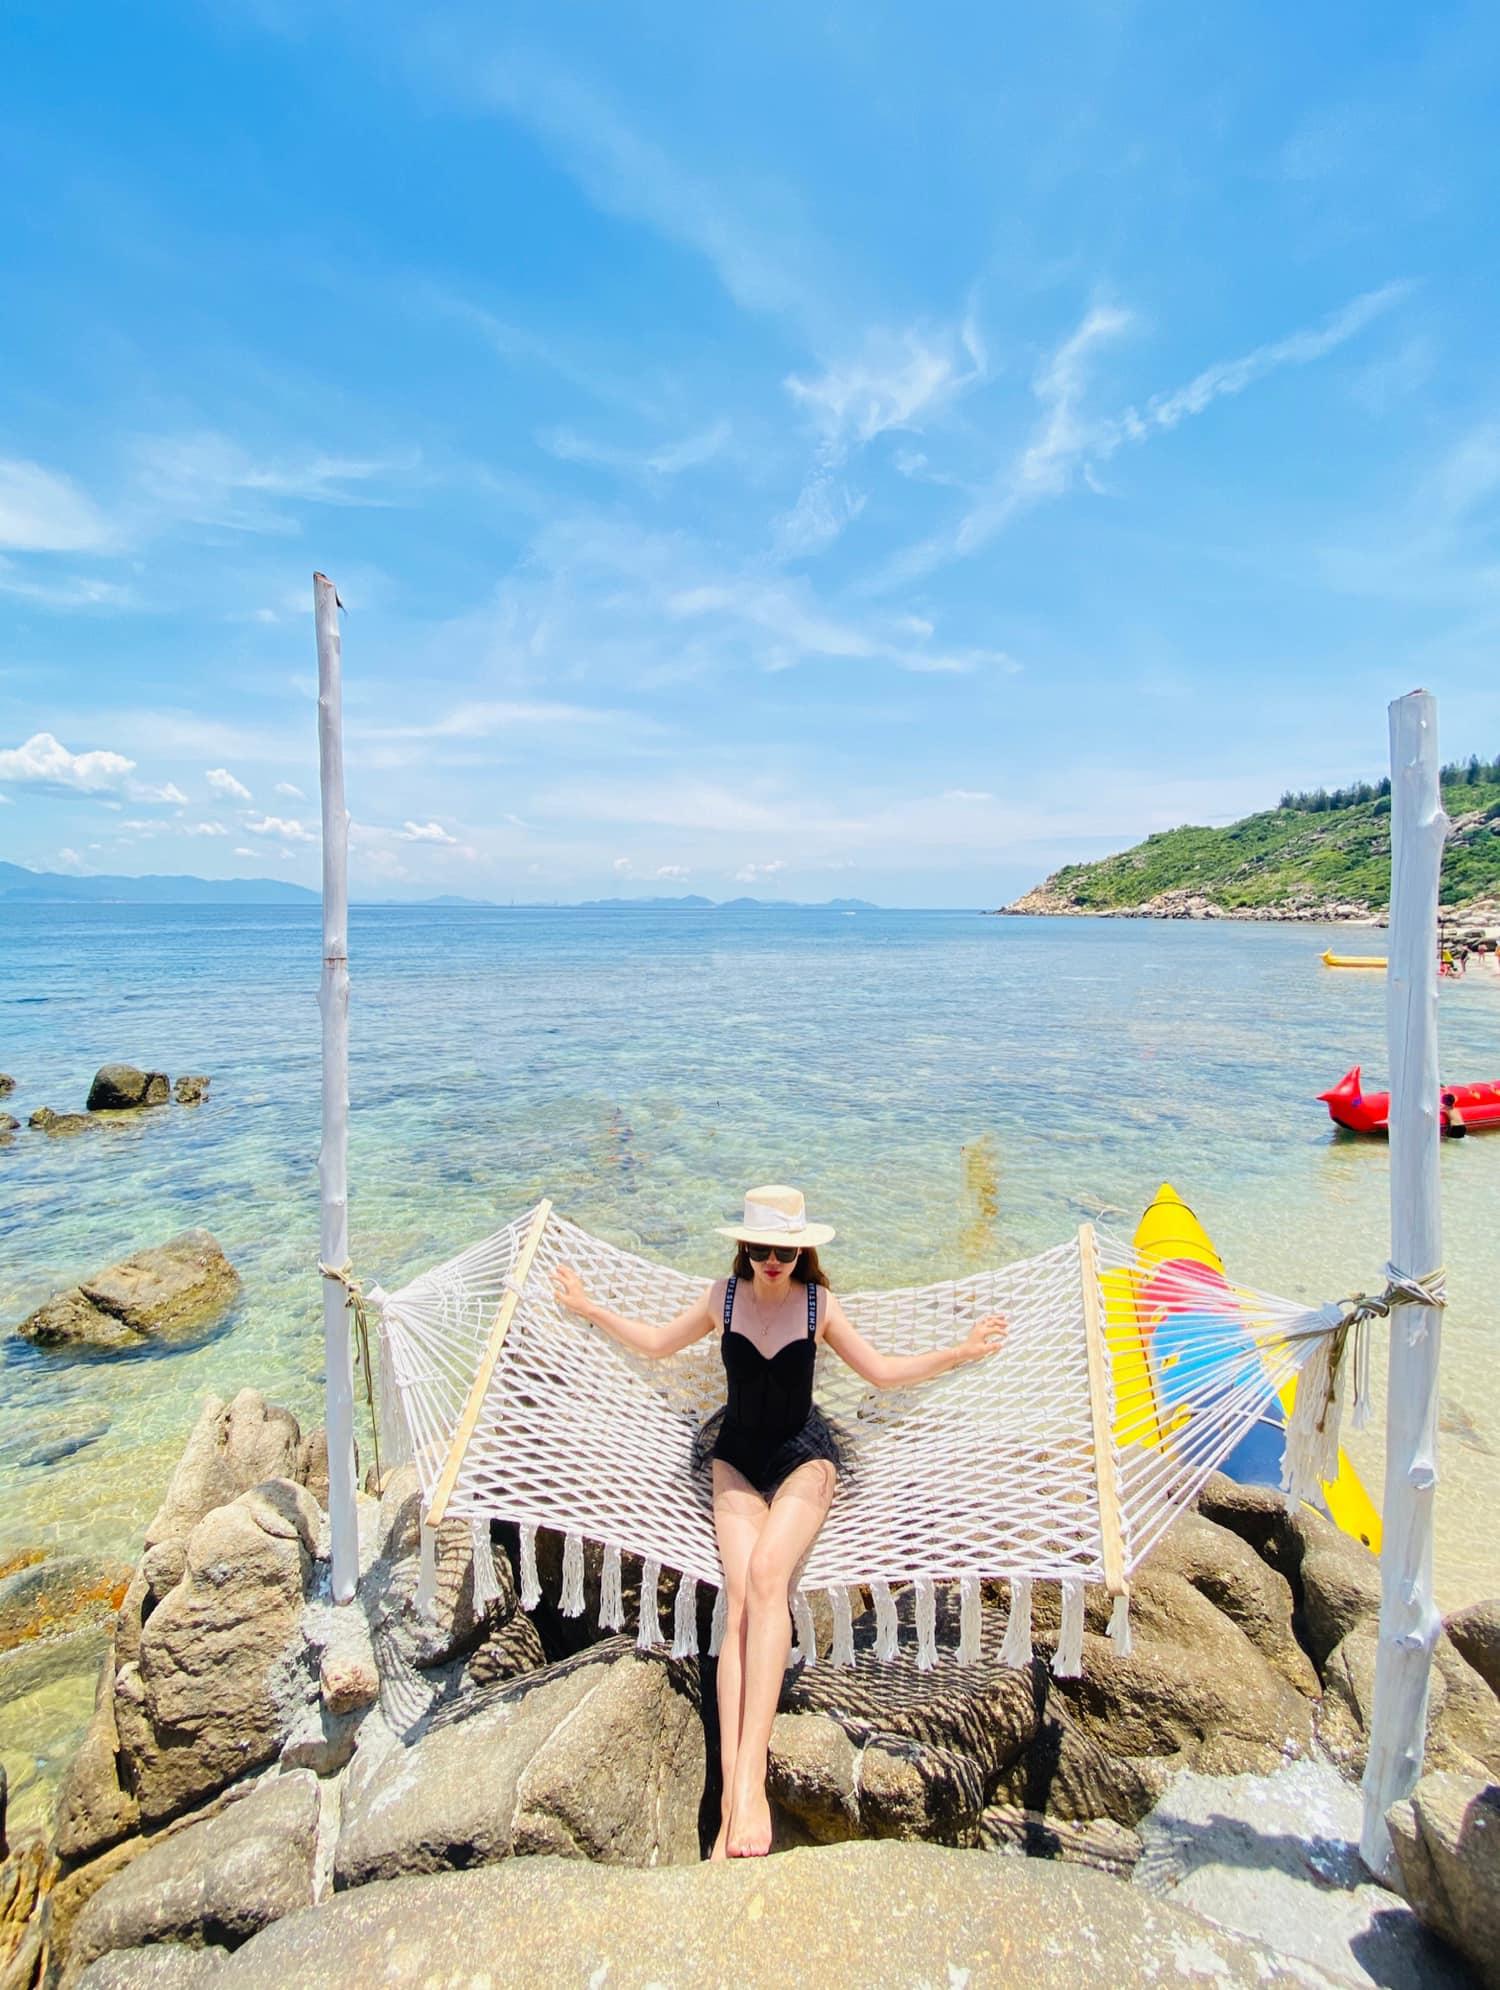 cu-lao-xanh_Review-chi-tiet-Quy-Nhon-4n3d